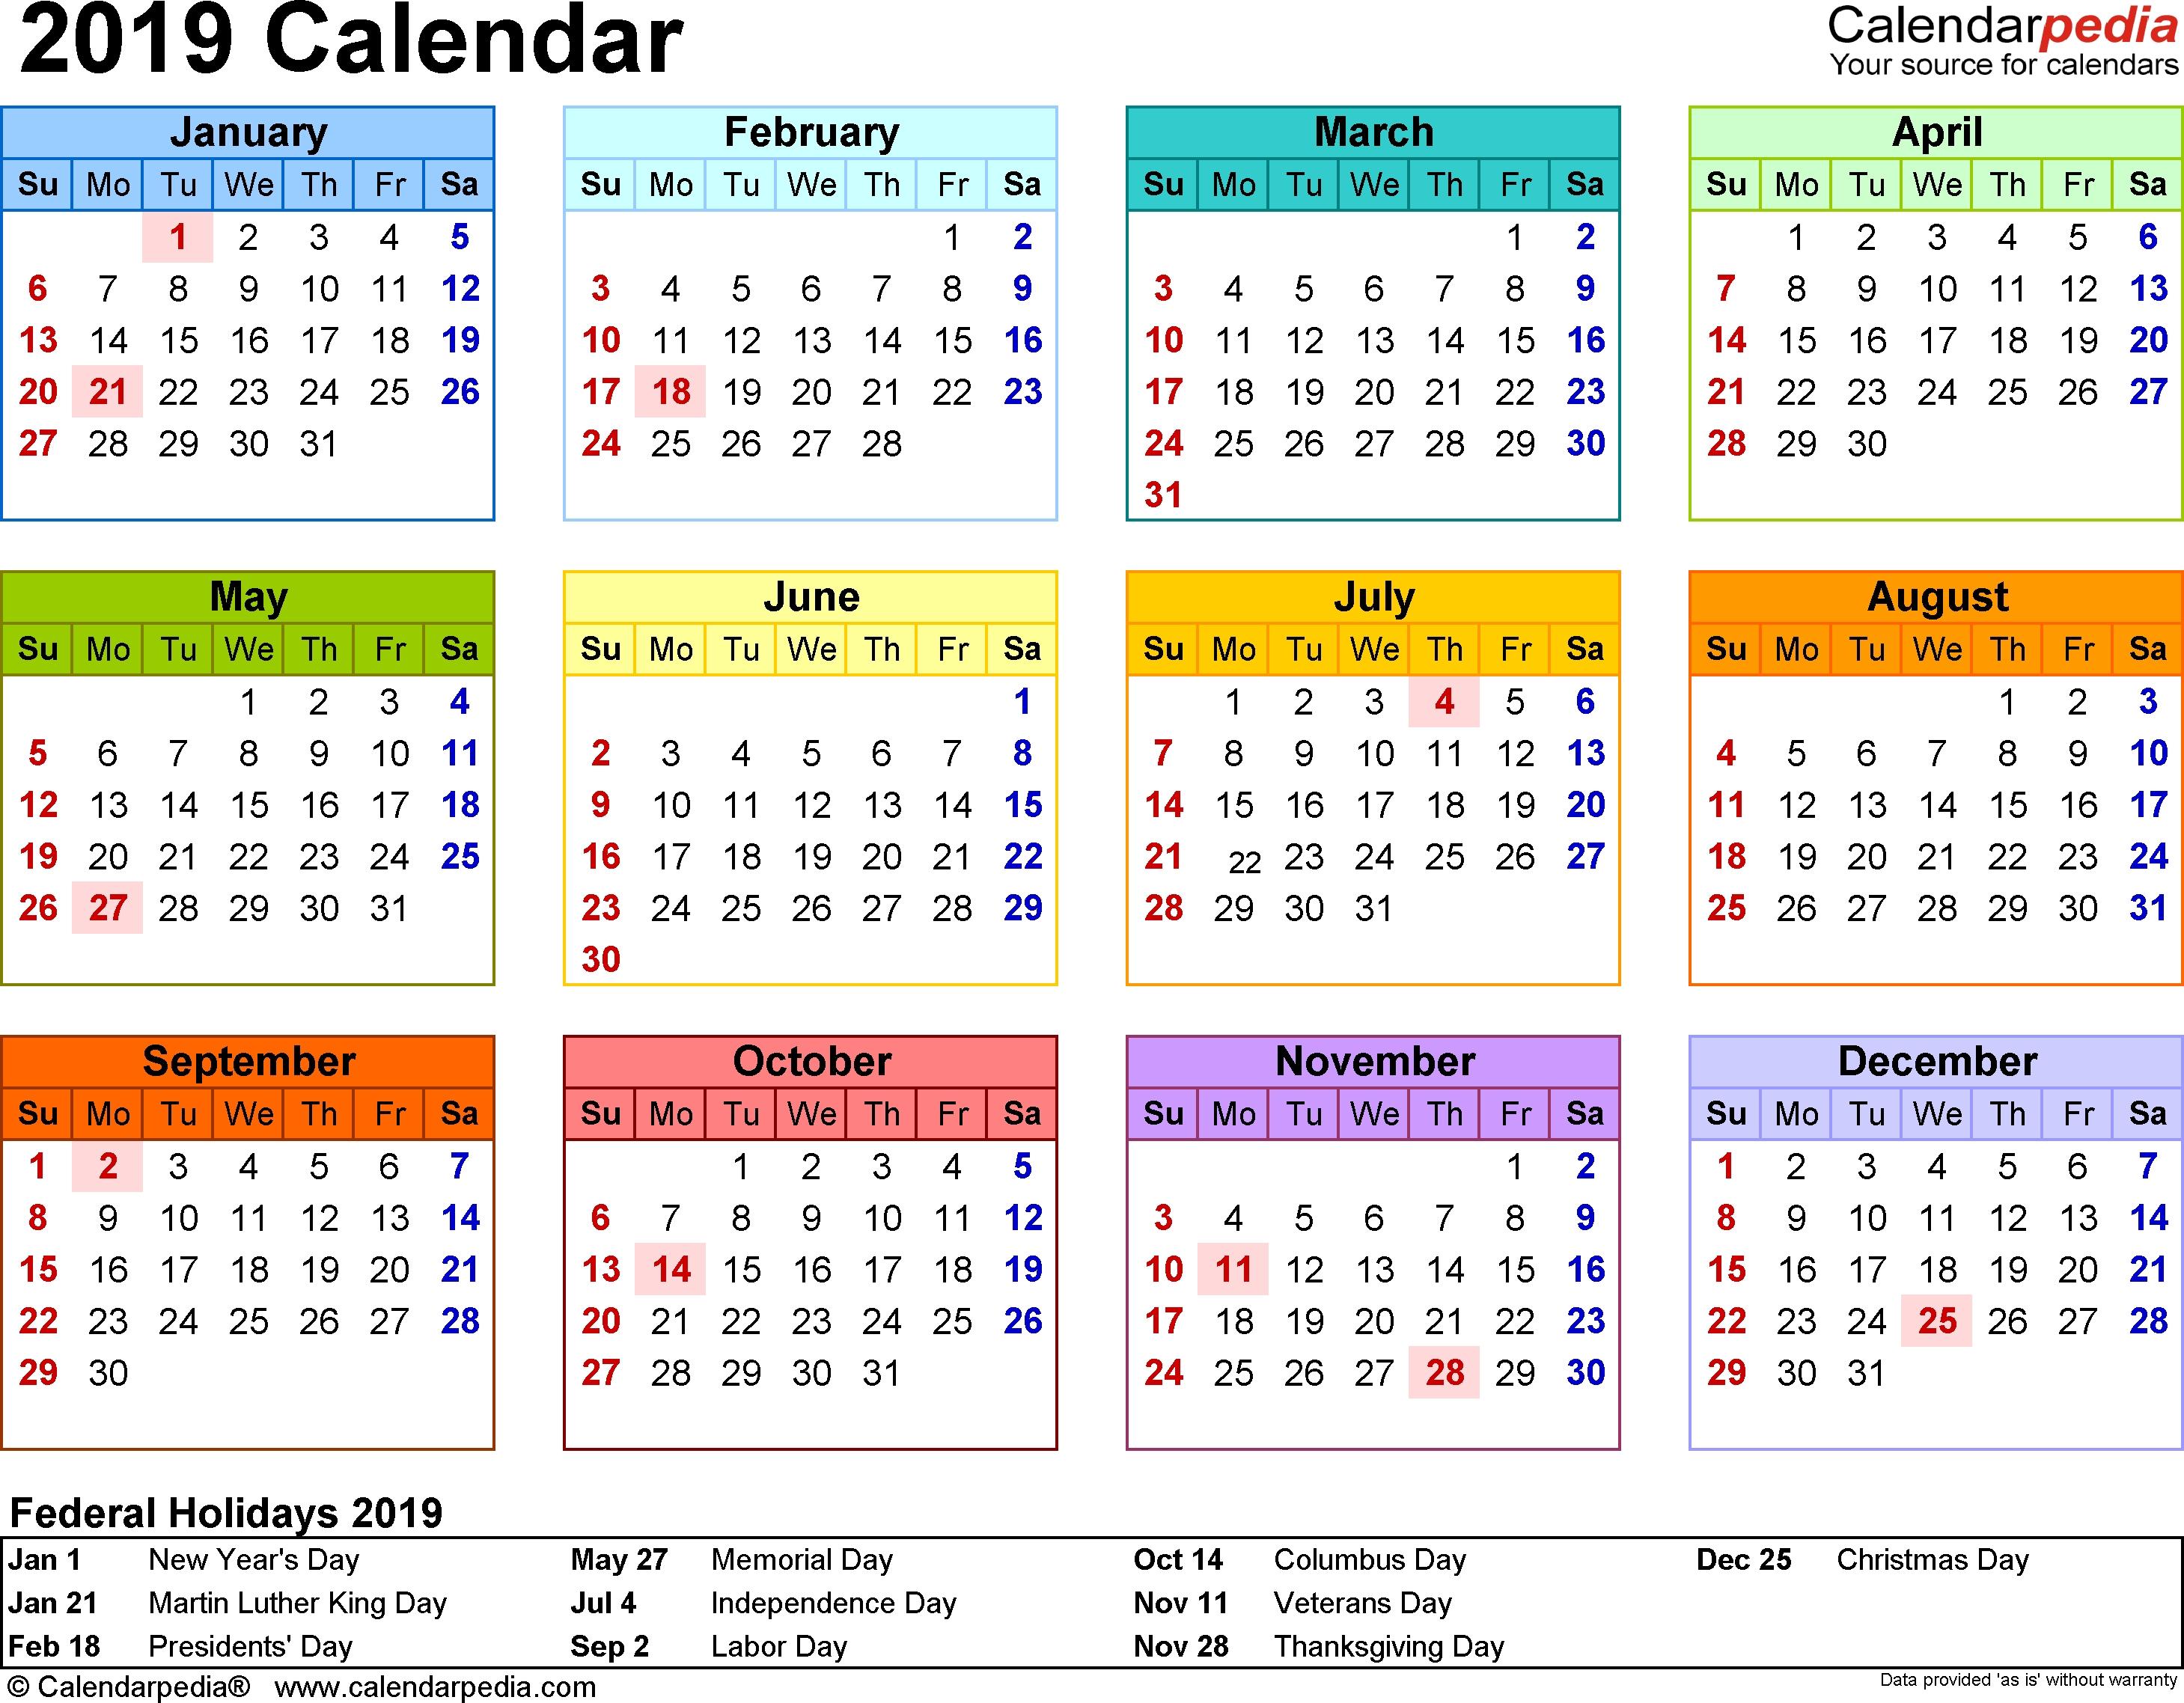 2019 Calendar - Download 17 Free Printable Excel Templates (.xlsx)